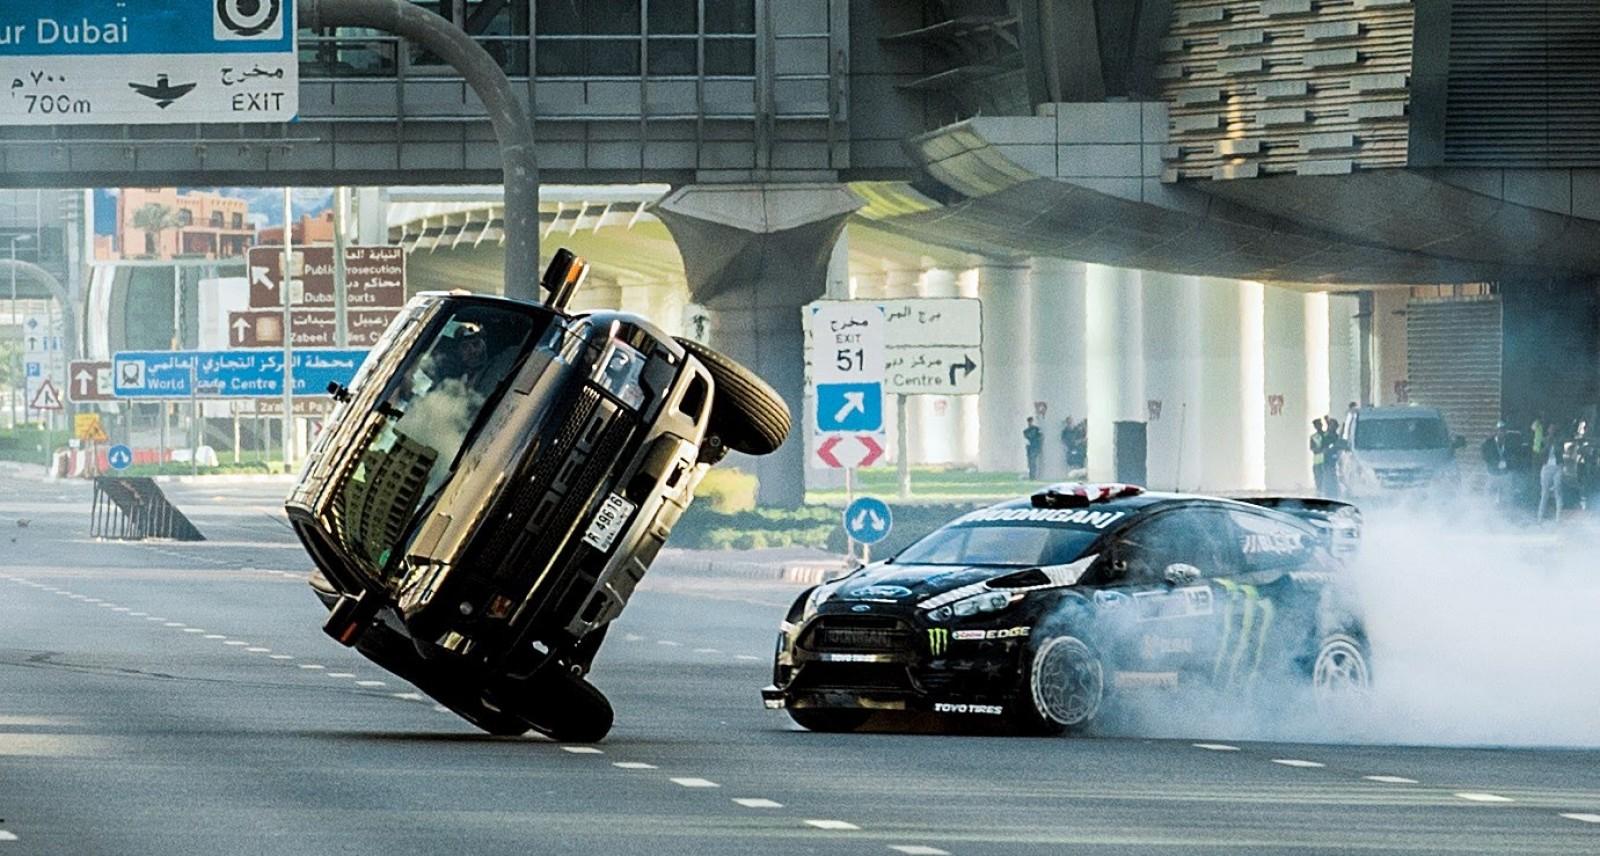 Motorcycle And Car Drift Wallpaper Watch Ken Block Drift Through Dubai Like A Madman In His